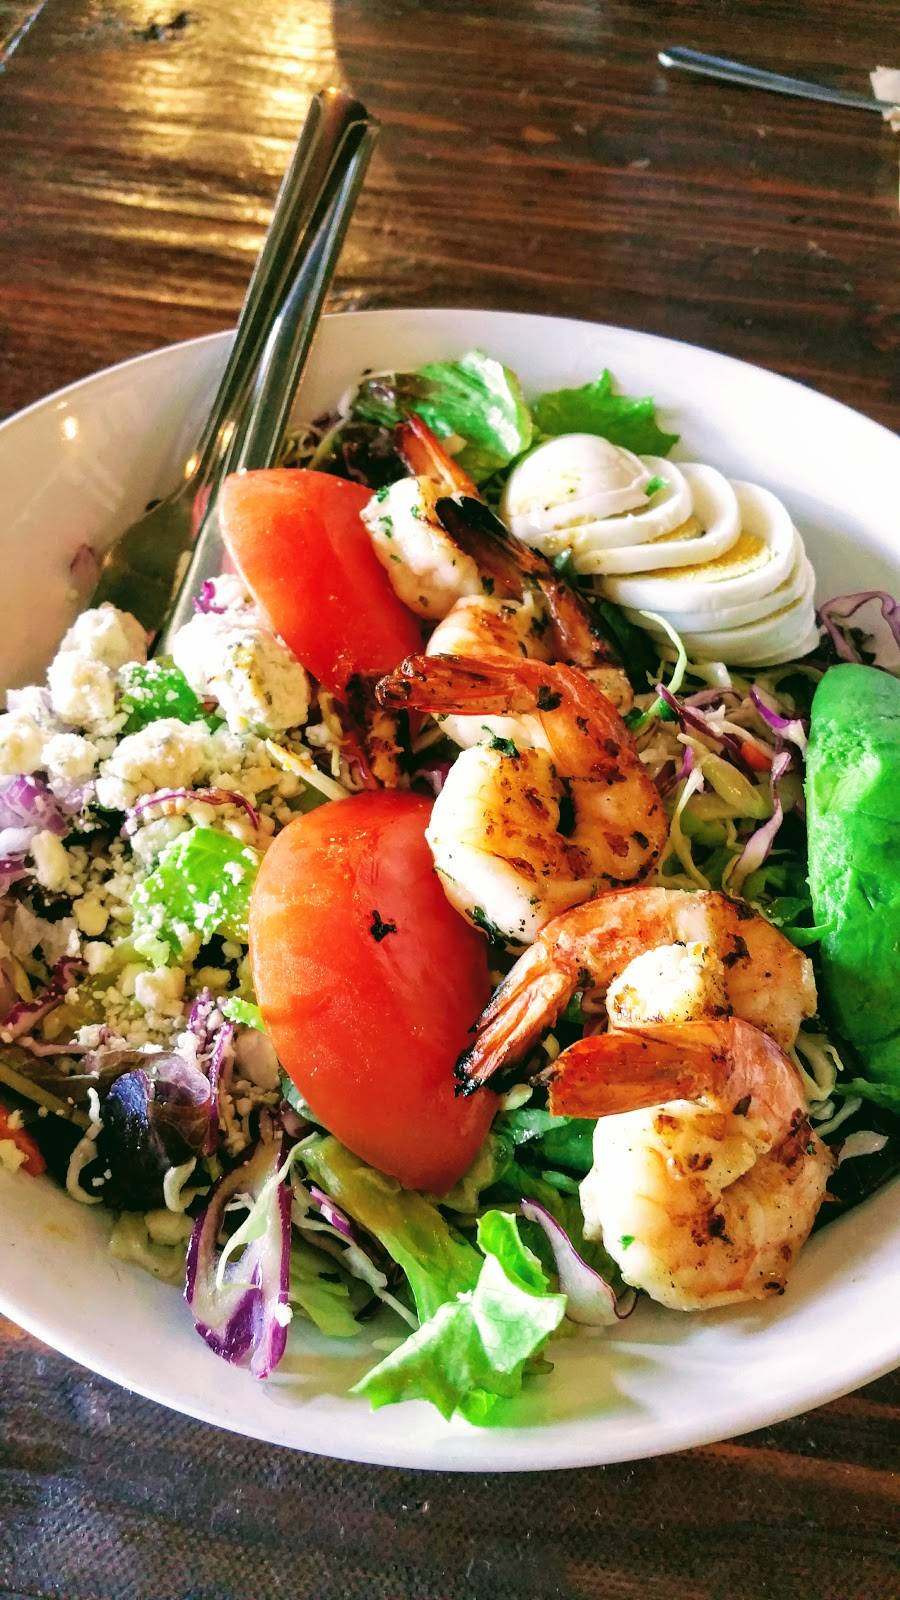 Pier 76 Fish Grill   restaurant   11265 183rd St, Cerritos, CA 90703, USA   5624021776 OR +1 562-402-1776